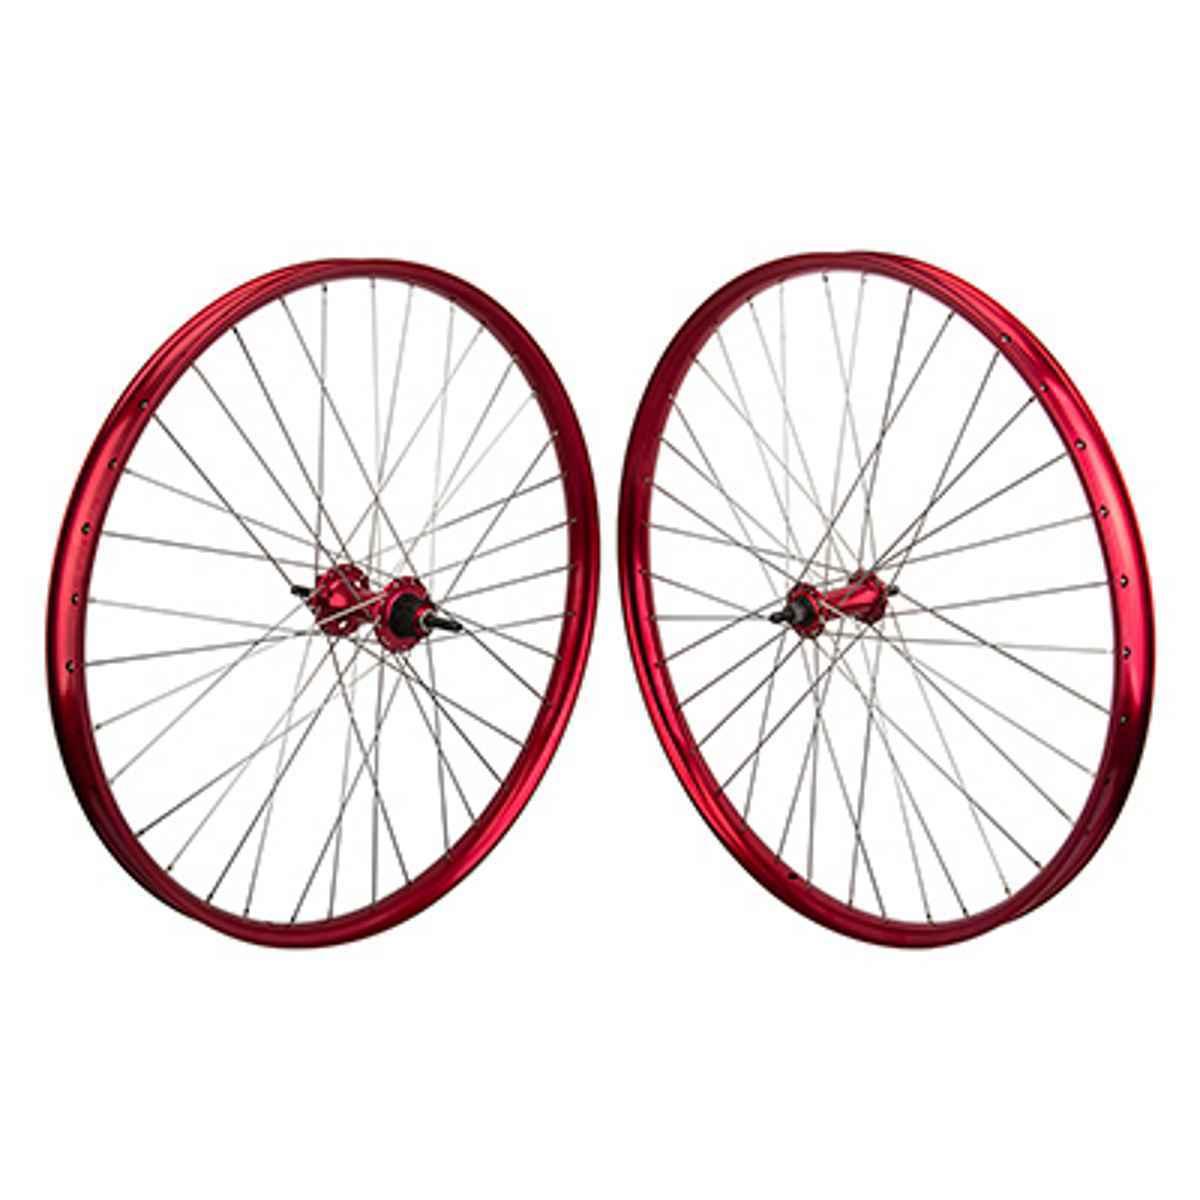 Wheel Masters Wheel Set WHL PR 27.5 584x36 SE BIKES BEAST MODE 36